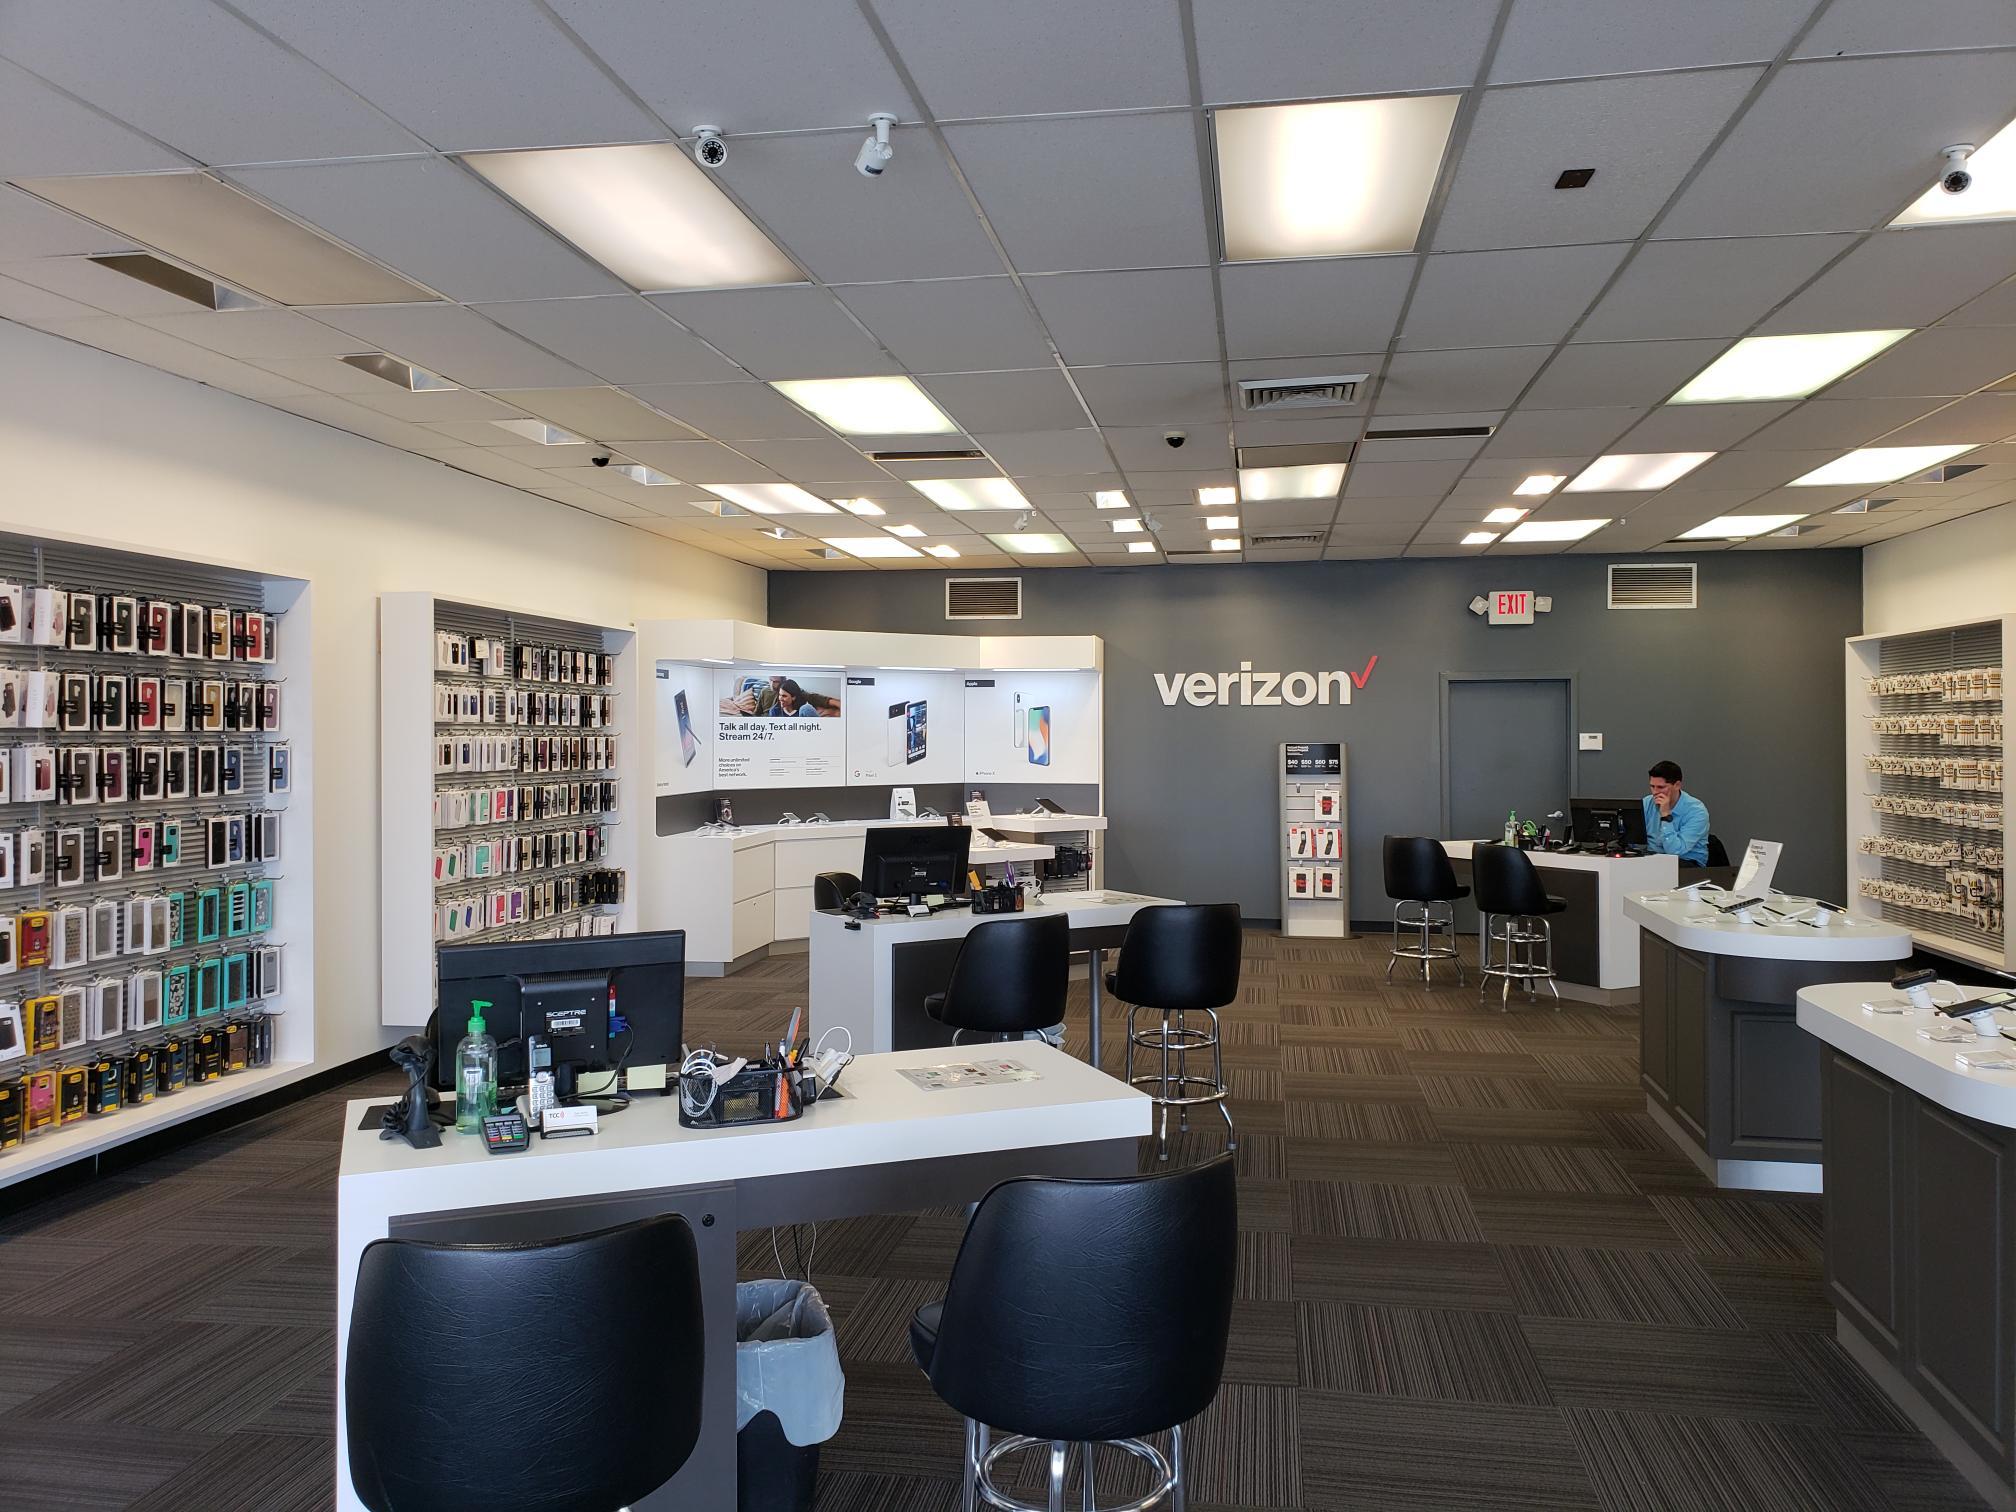 Verizon Authorized Retailer – TCC image 10